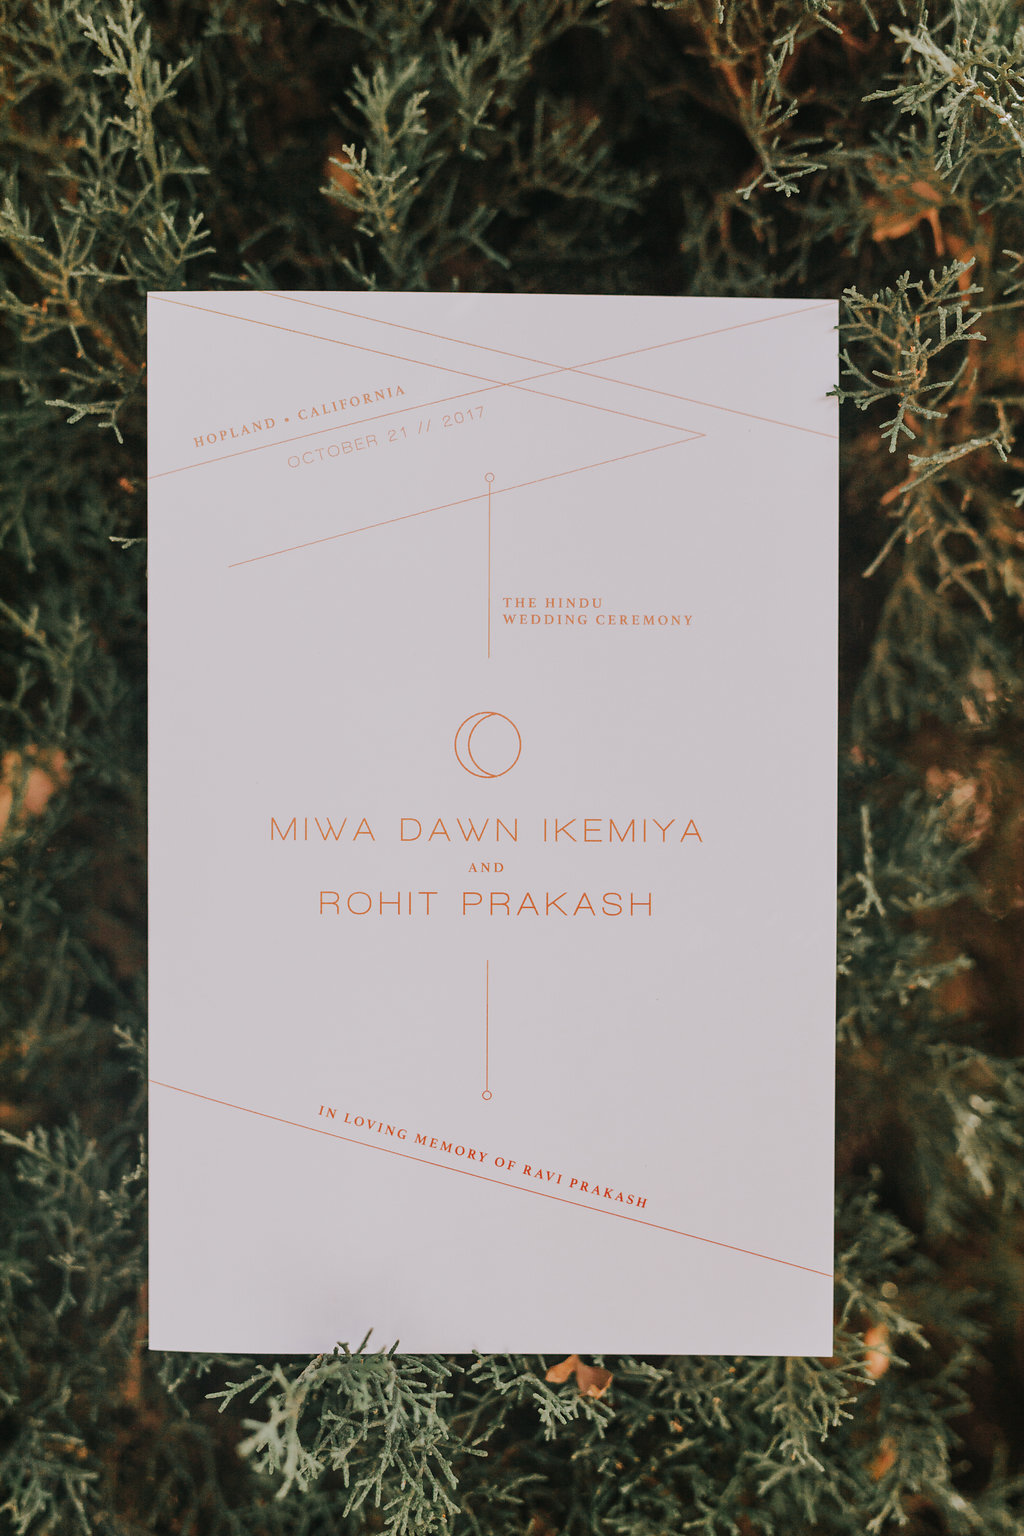 Event Production & Design